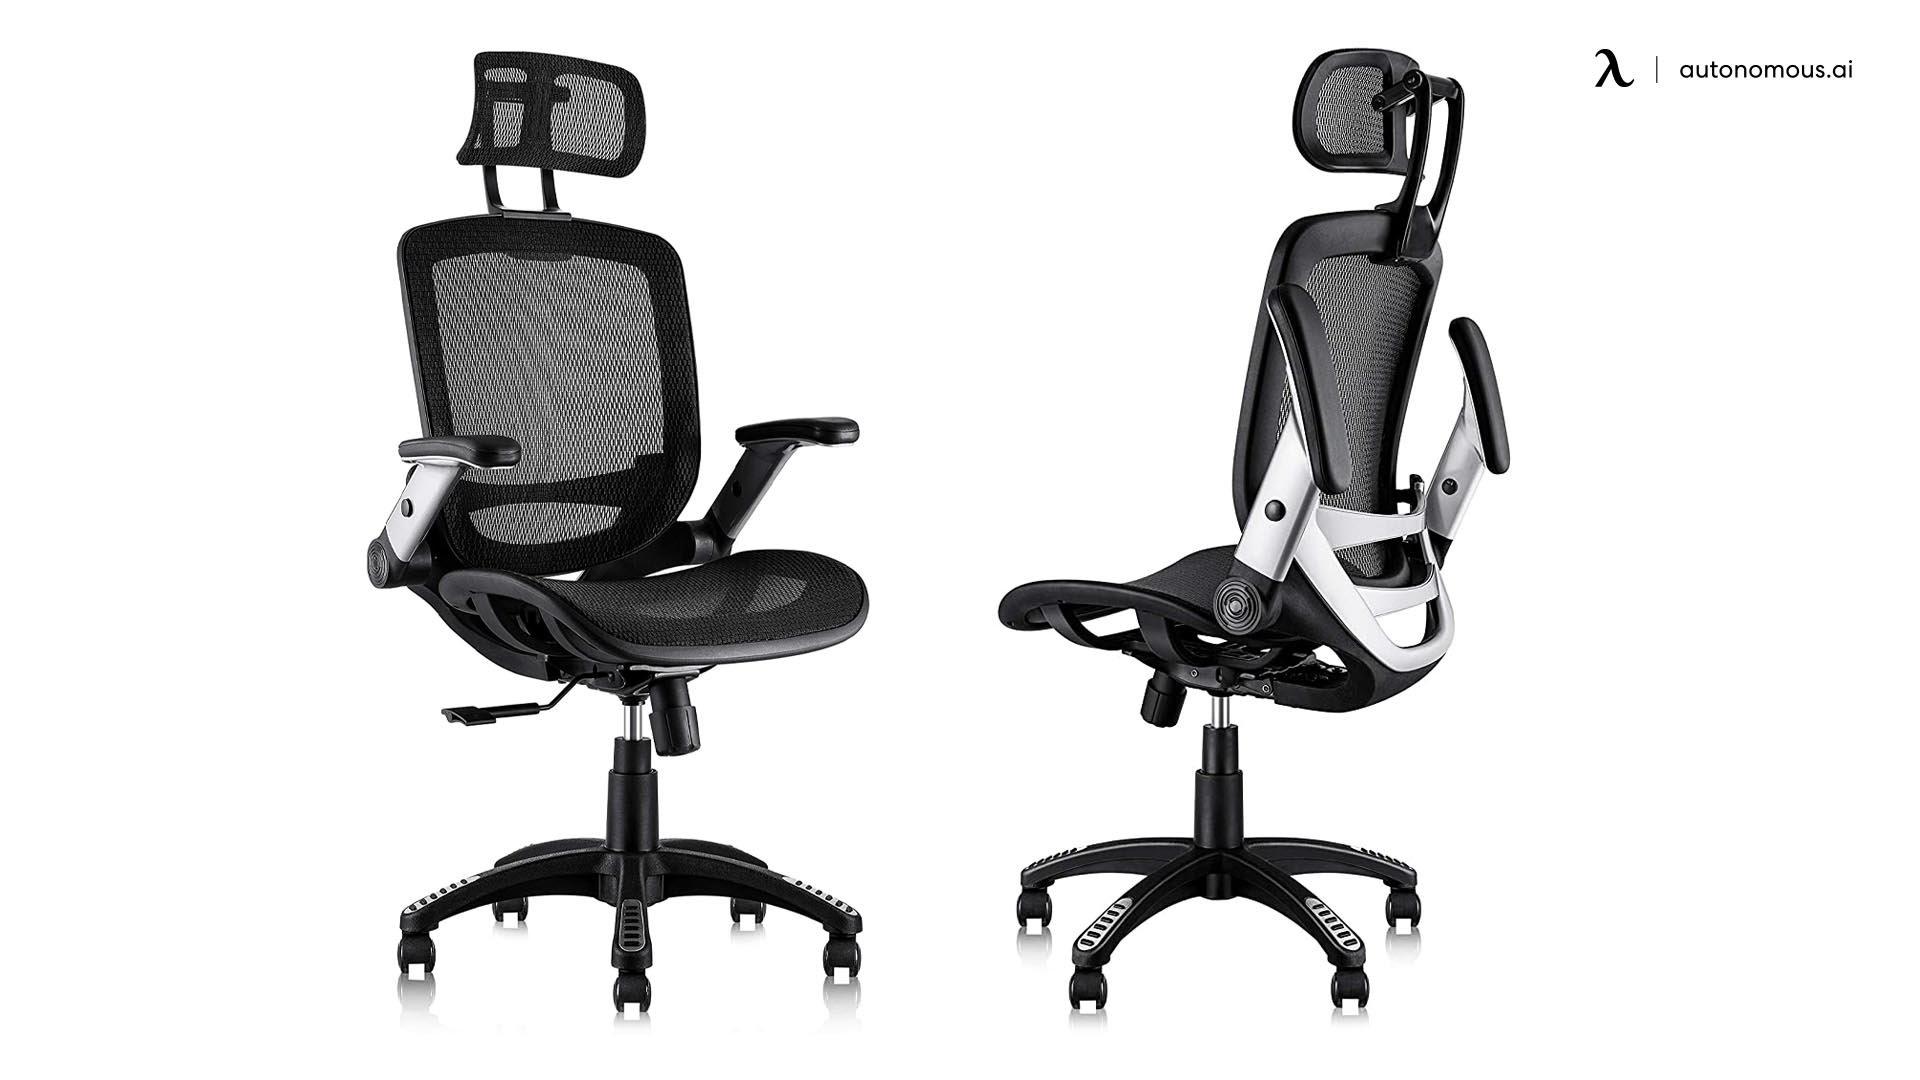 Gabrylly Ergonomic Cheap Comfortable Office Chair